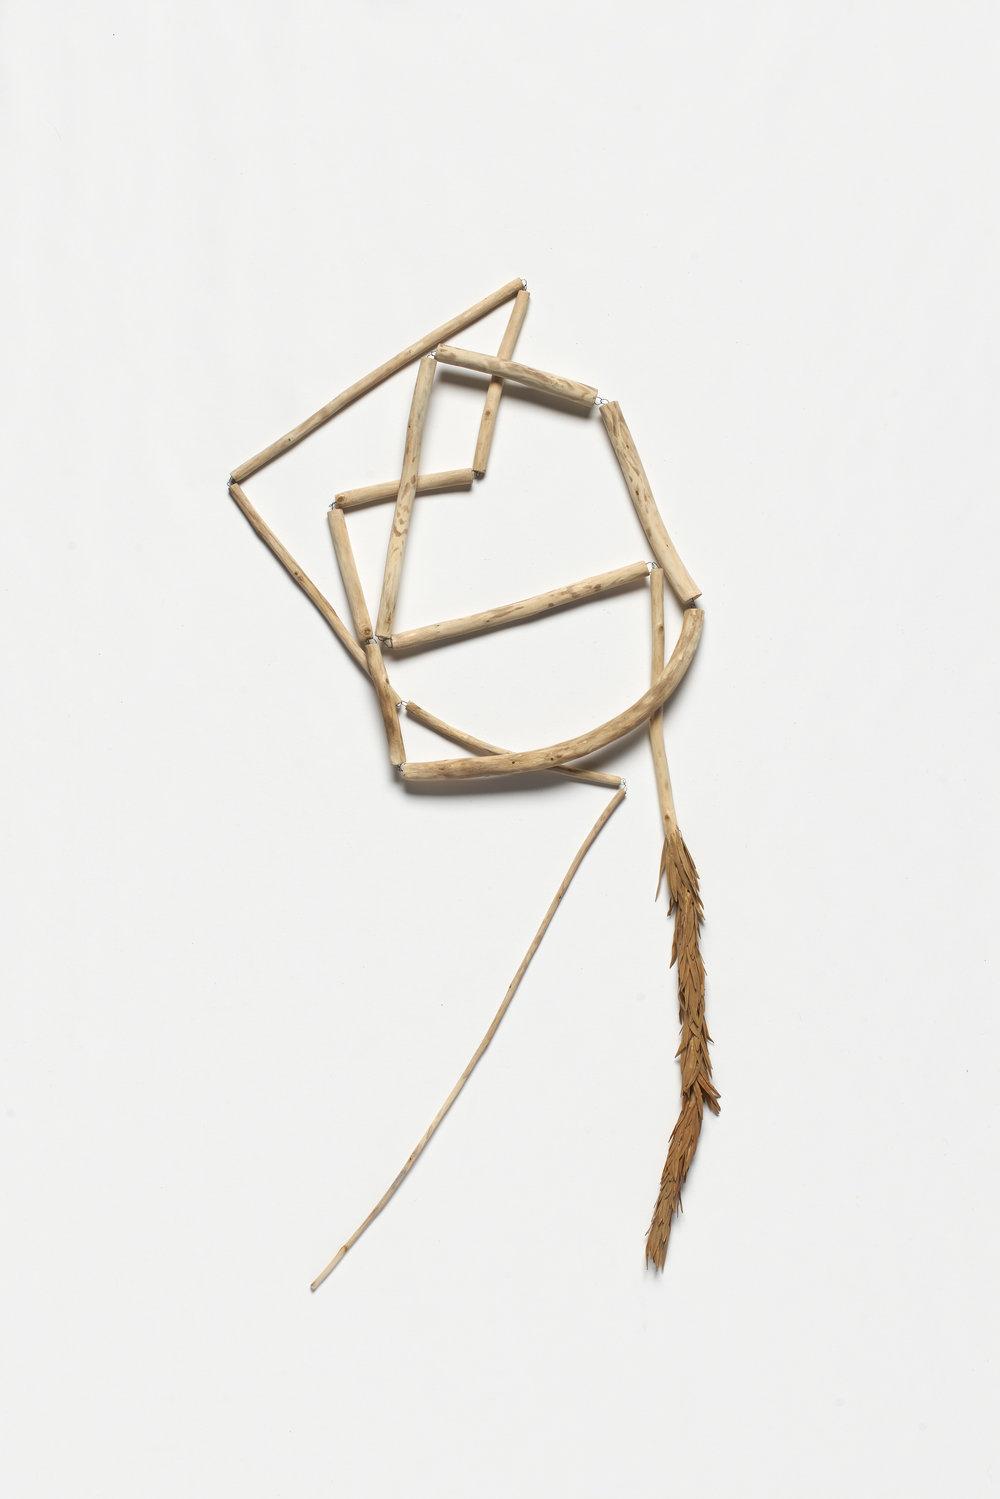 Cara Johnson,  creek , 2016. crack willow, iron, paper. Image Jeremy Dillon